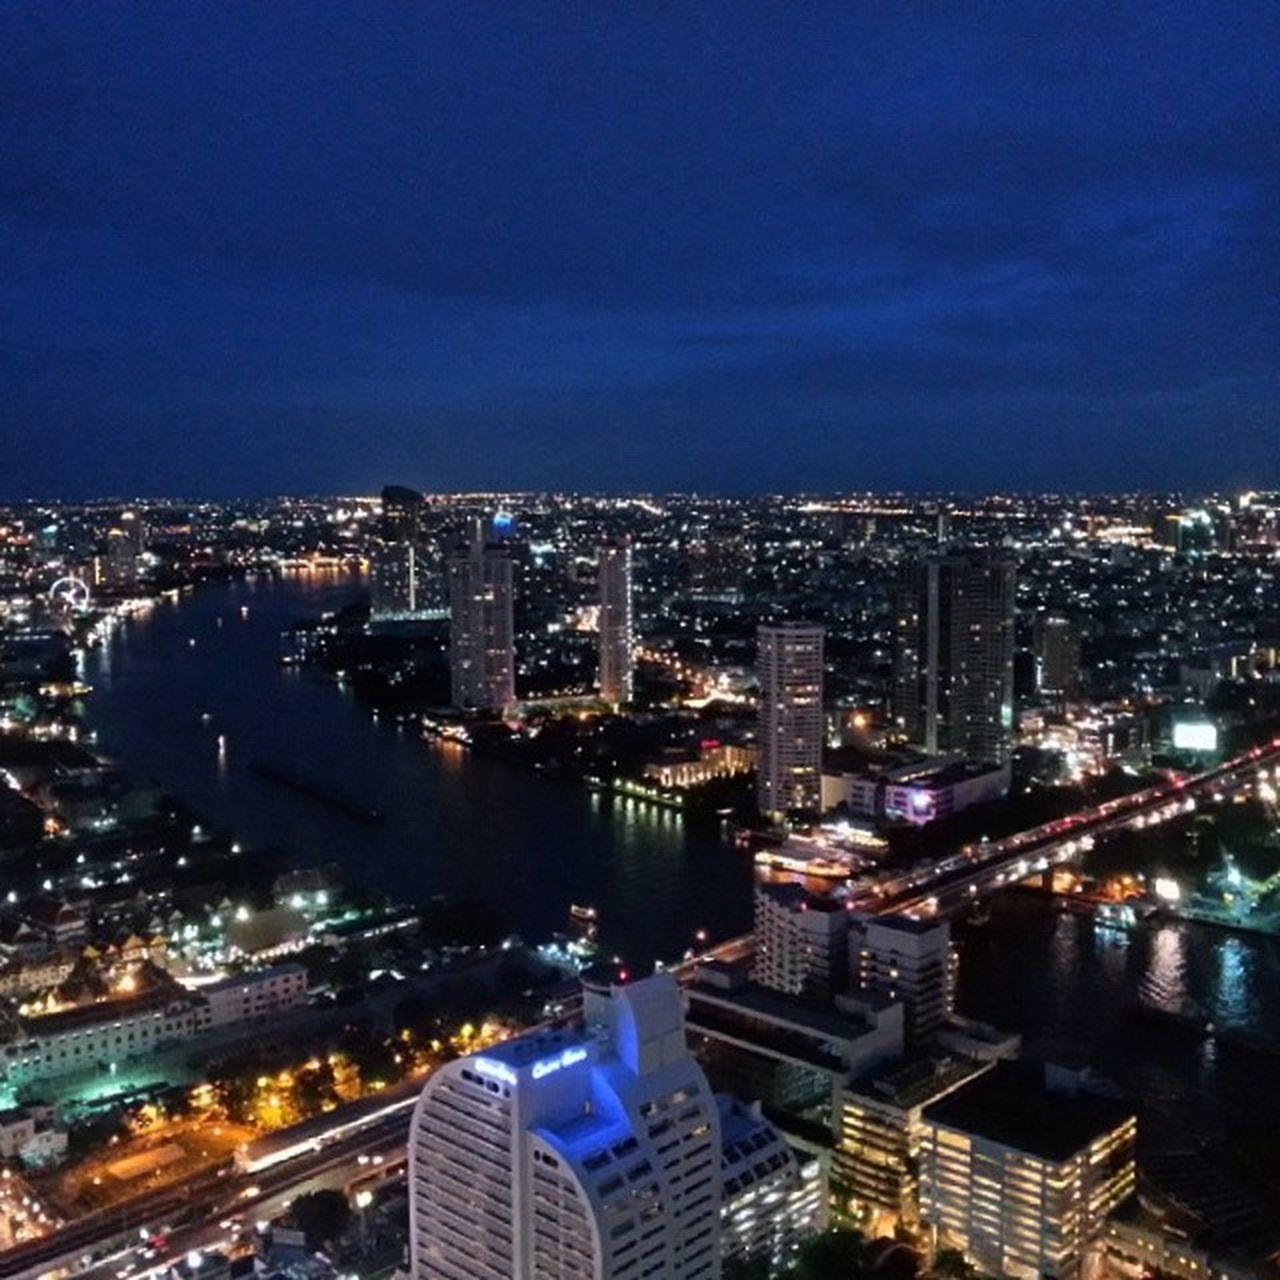 cityscape, illuminated, city, architecture, night, building exterior, modern, no people, skyscraper, sky, outdoors